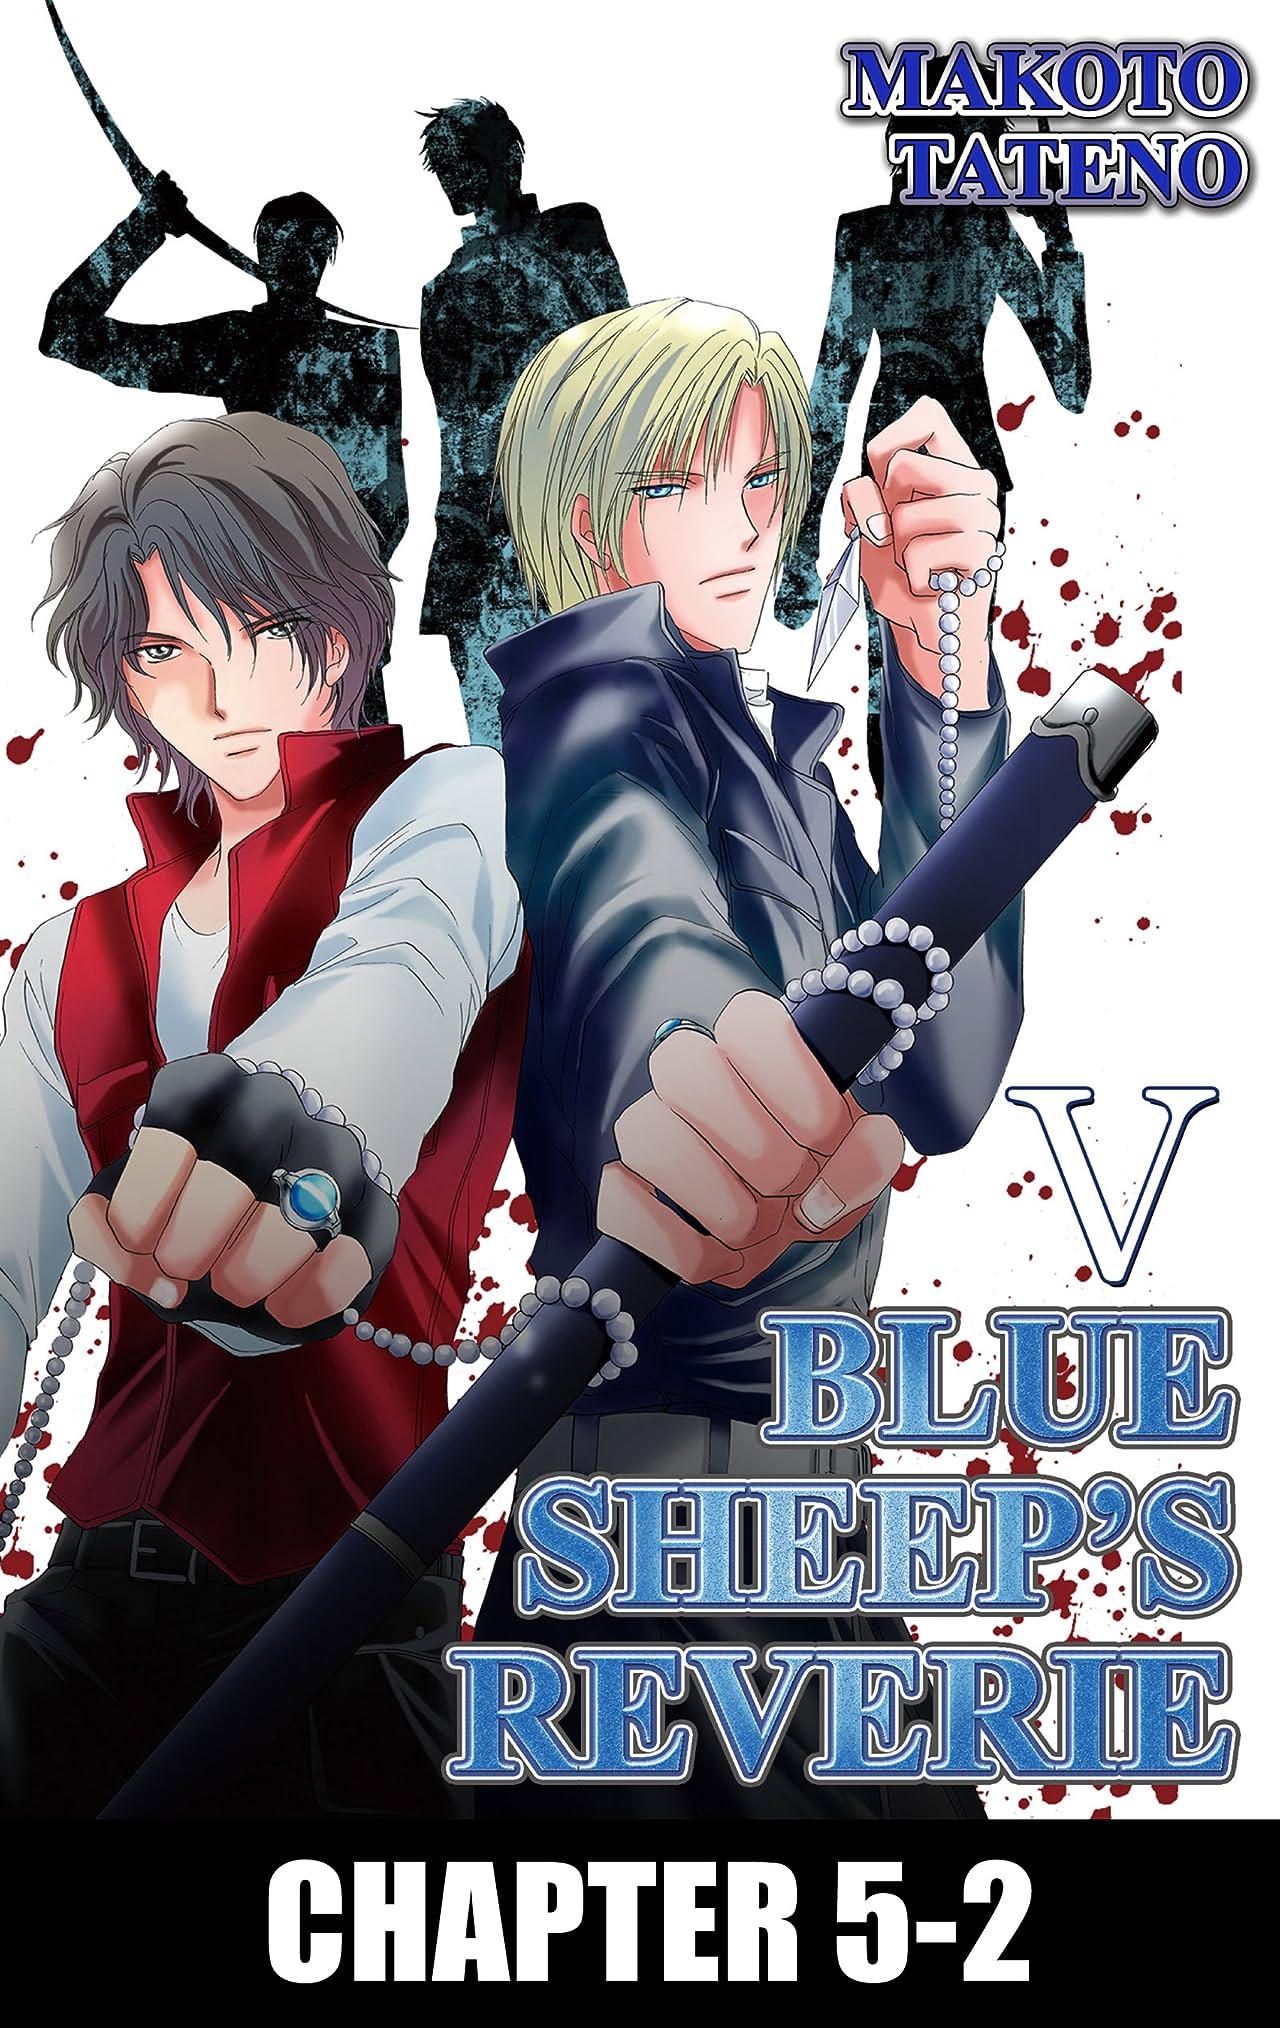 BLUE SHEEP'S REVERIE (Yaoi Manga) #17